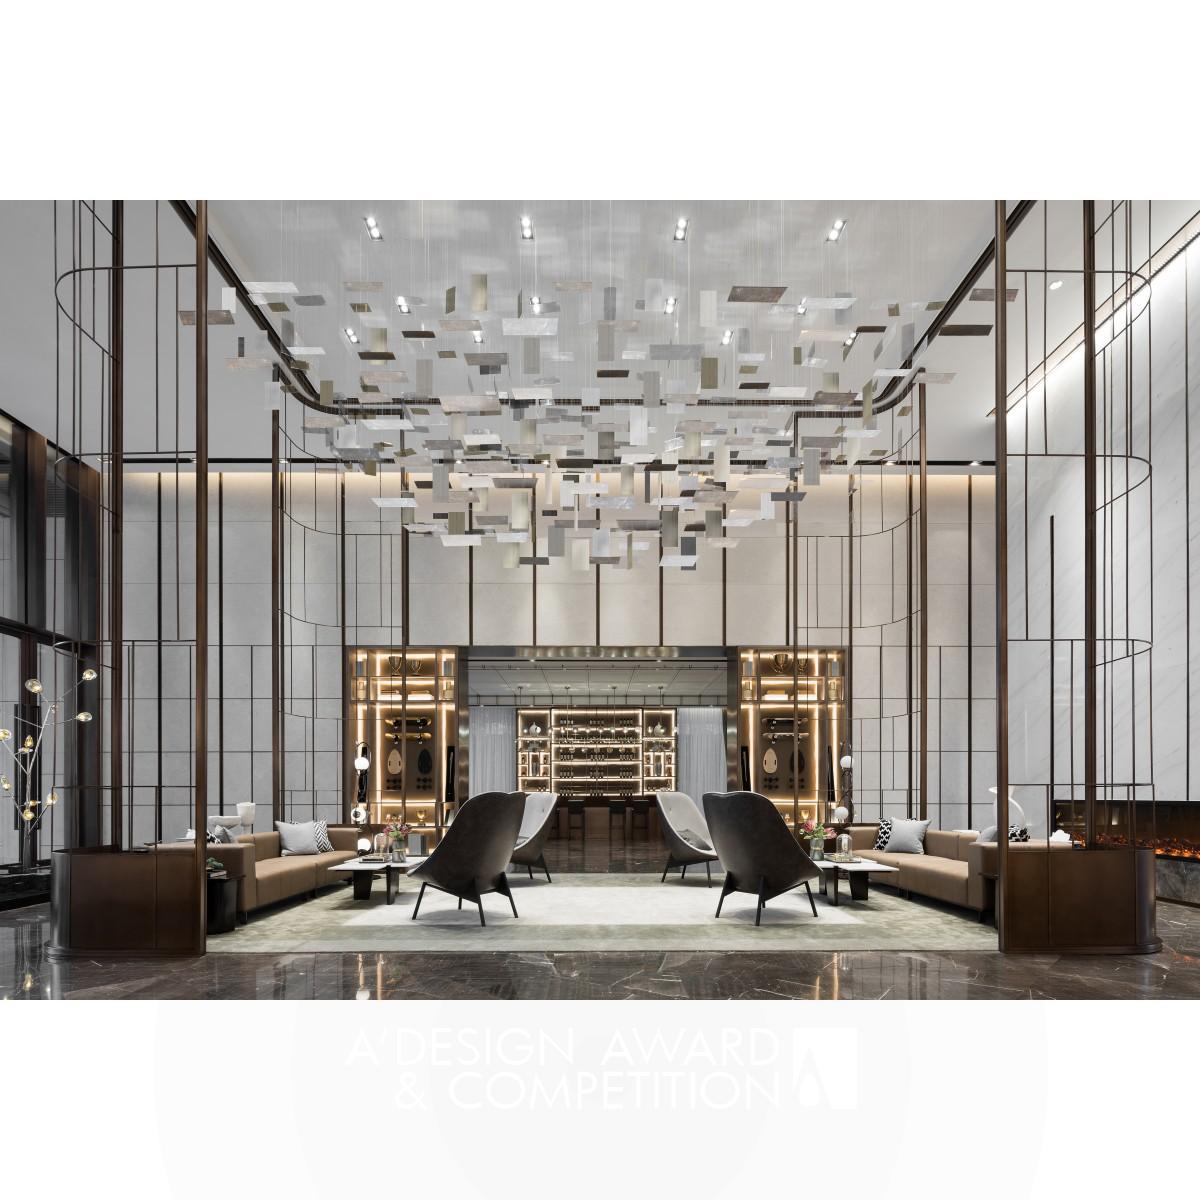 Shanghai Grace Seazen Interior Design